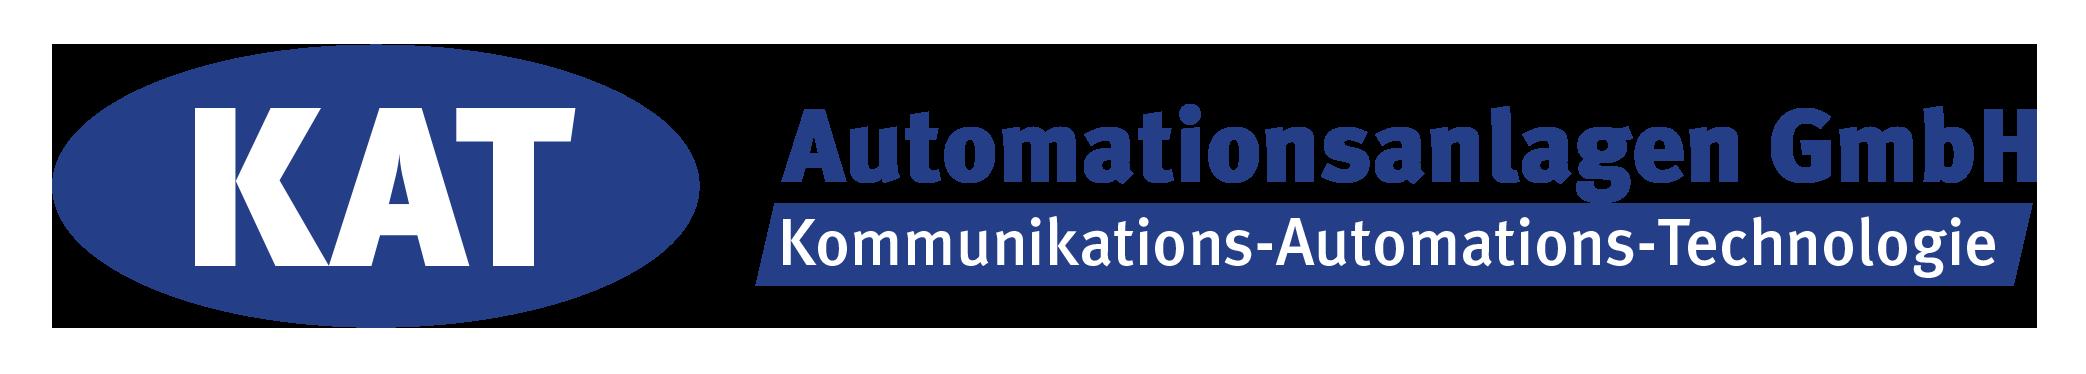 KAT Automationsanlagen